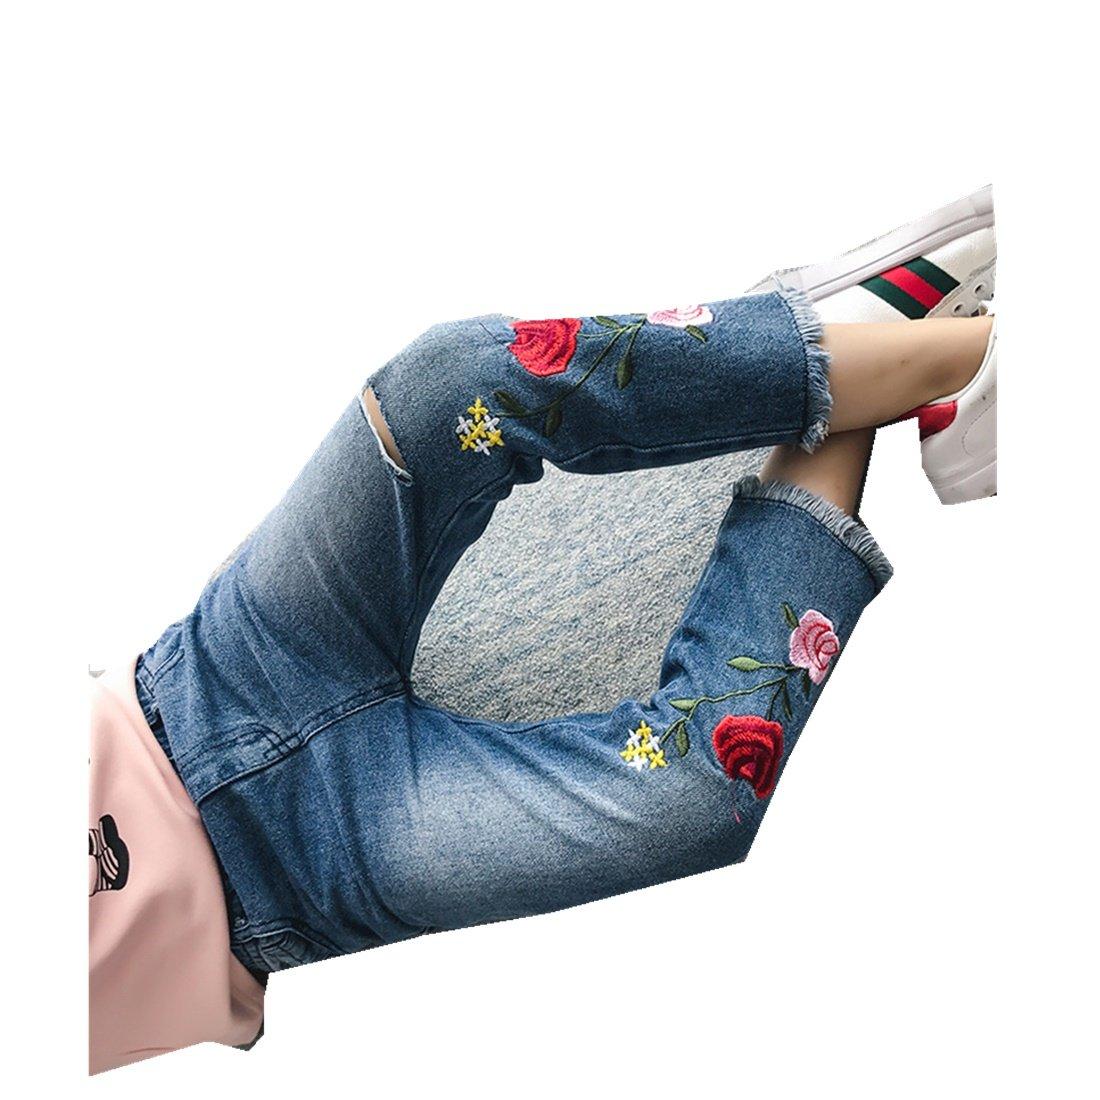 MV Children's Wear Pants Summer Spring Autumn Girls Jeans Baby Kids Trousers